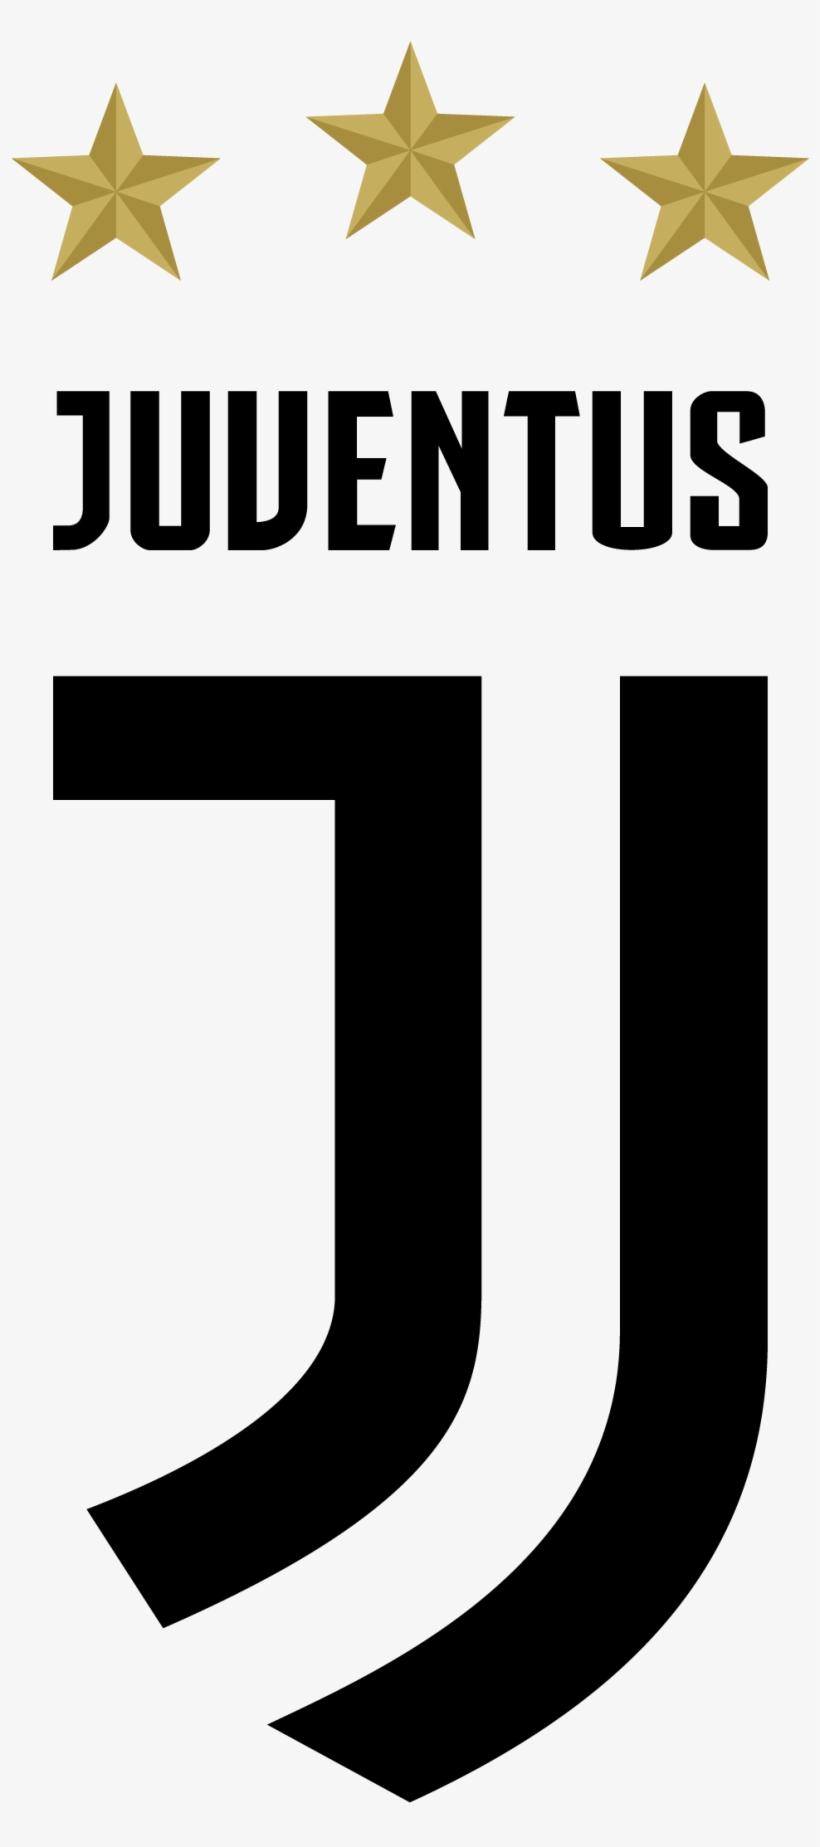 Juventus Logo Interesting History Of The Team Name.